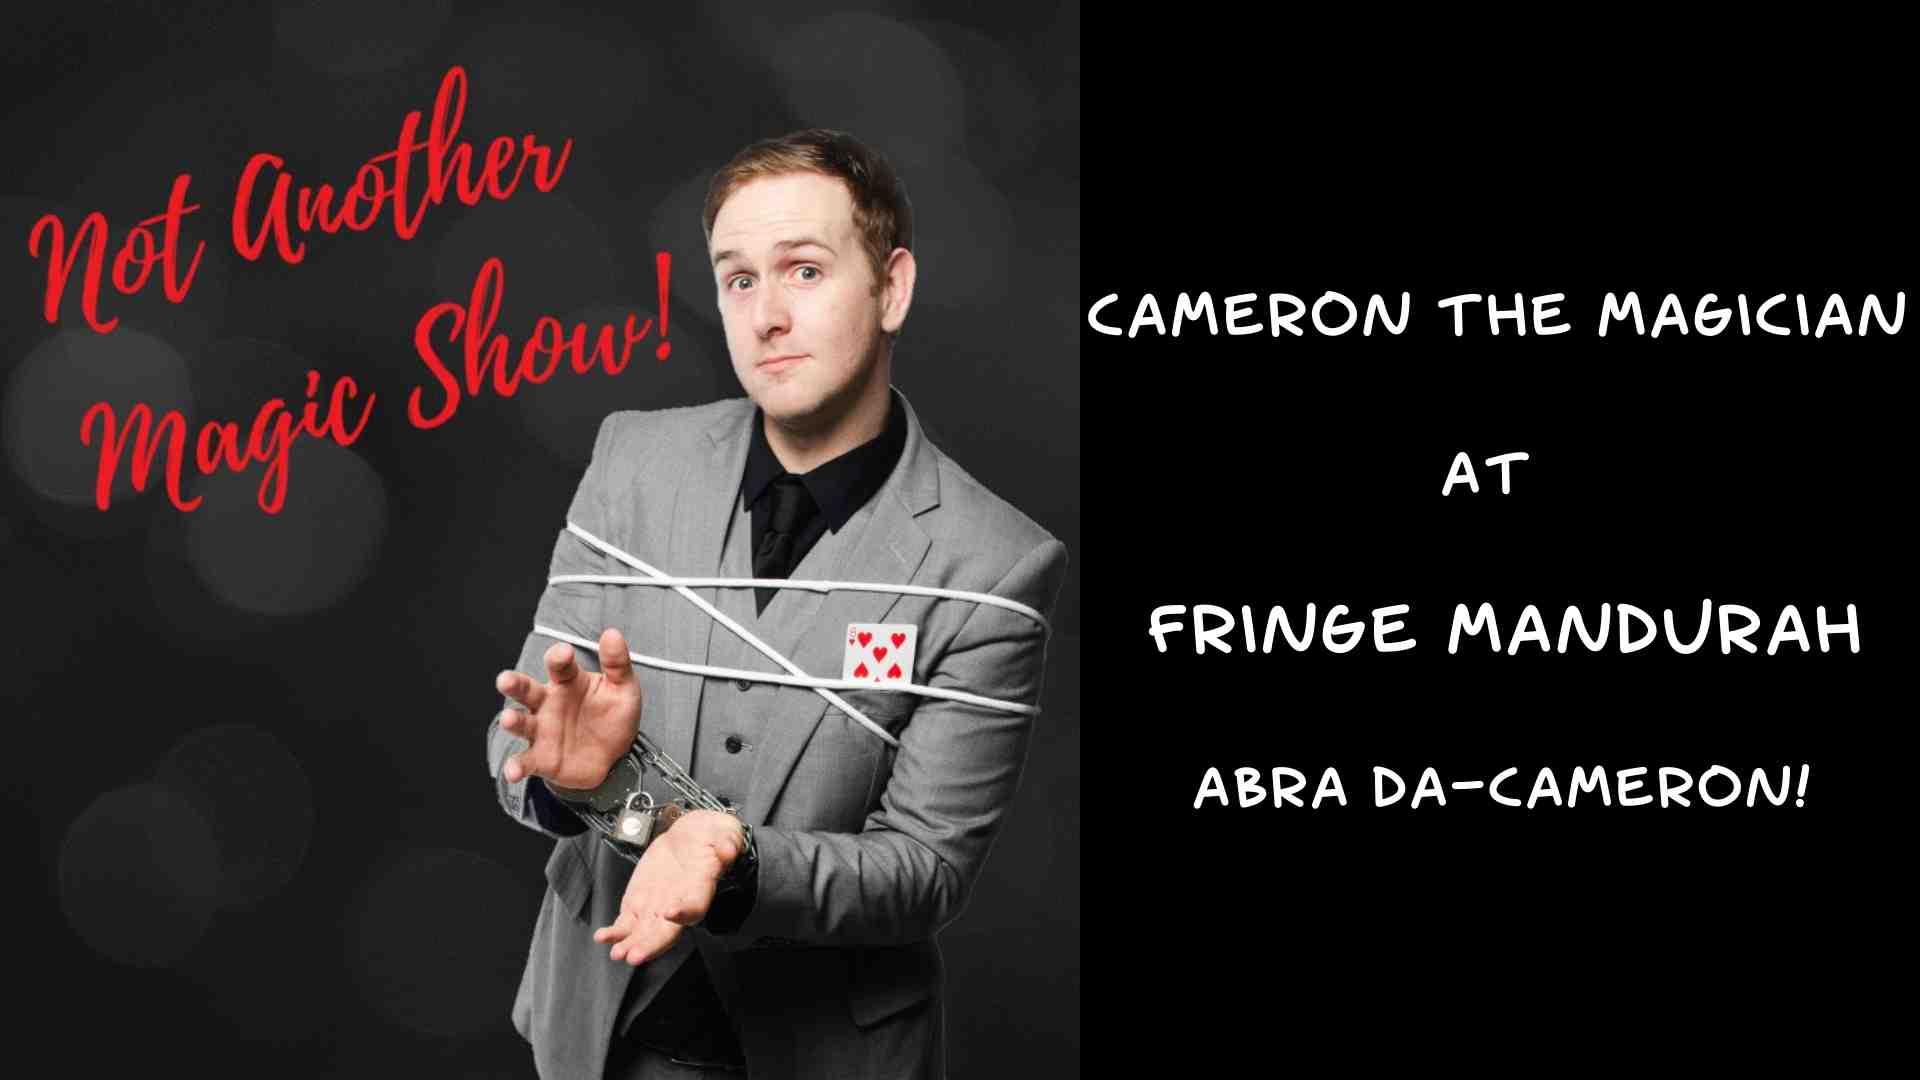 Cameron-the-Magician-Fringe-Mandurah